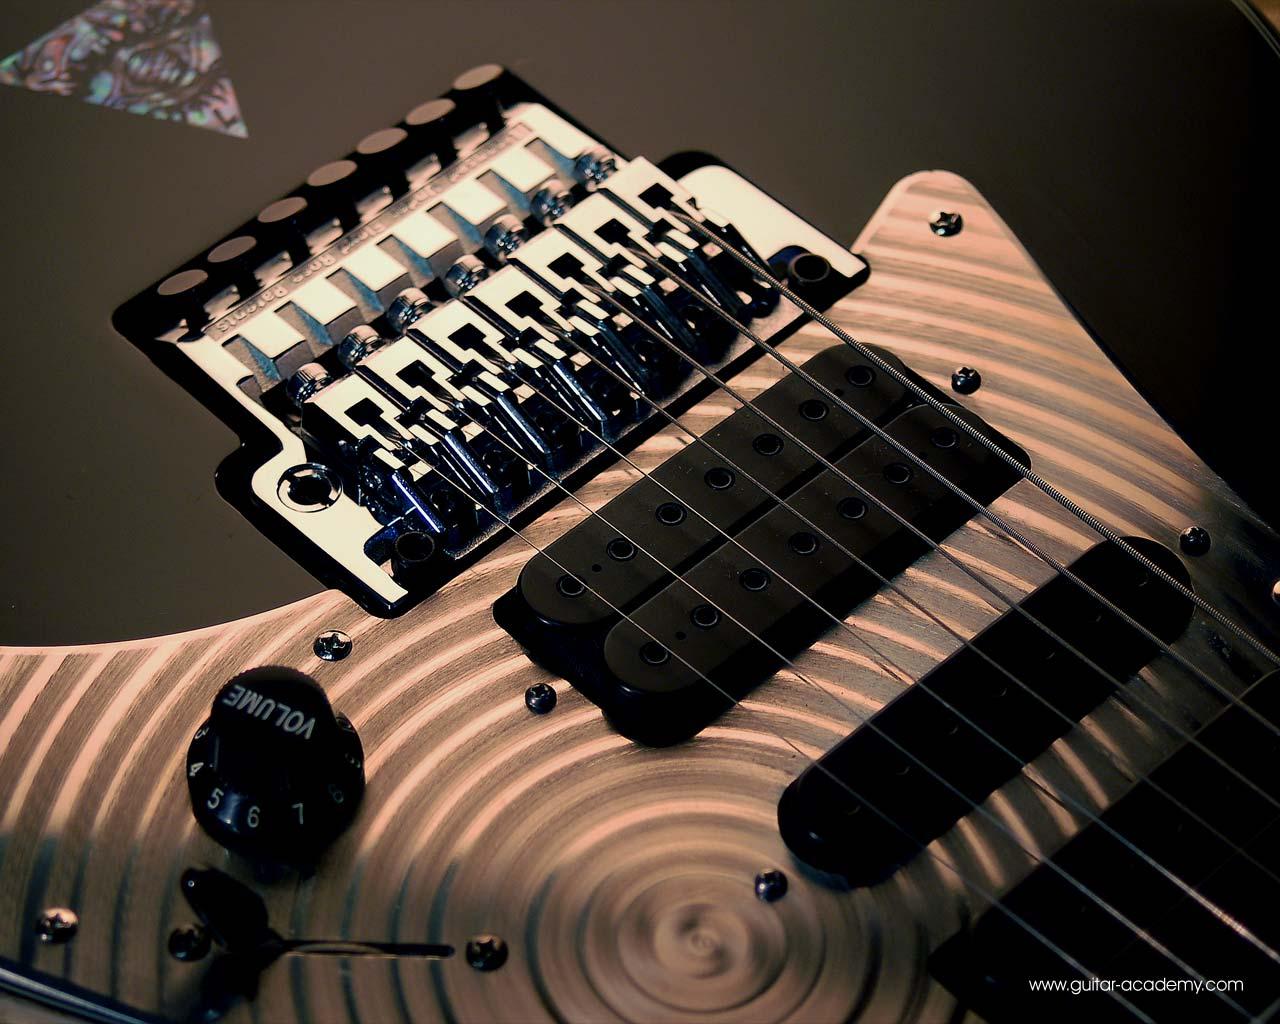 Hd wallpaper gitar - Guitar Wallpaper Ibanez Universe 7 String Guitar With Spiral Scratch Plate